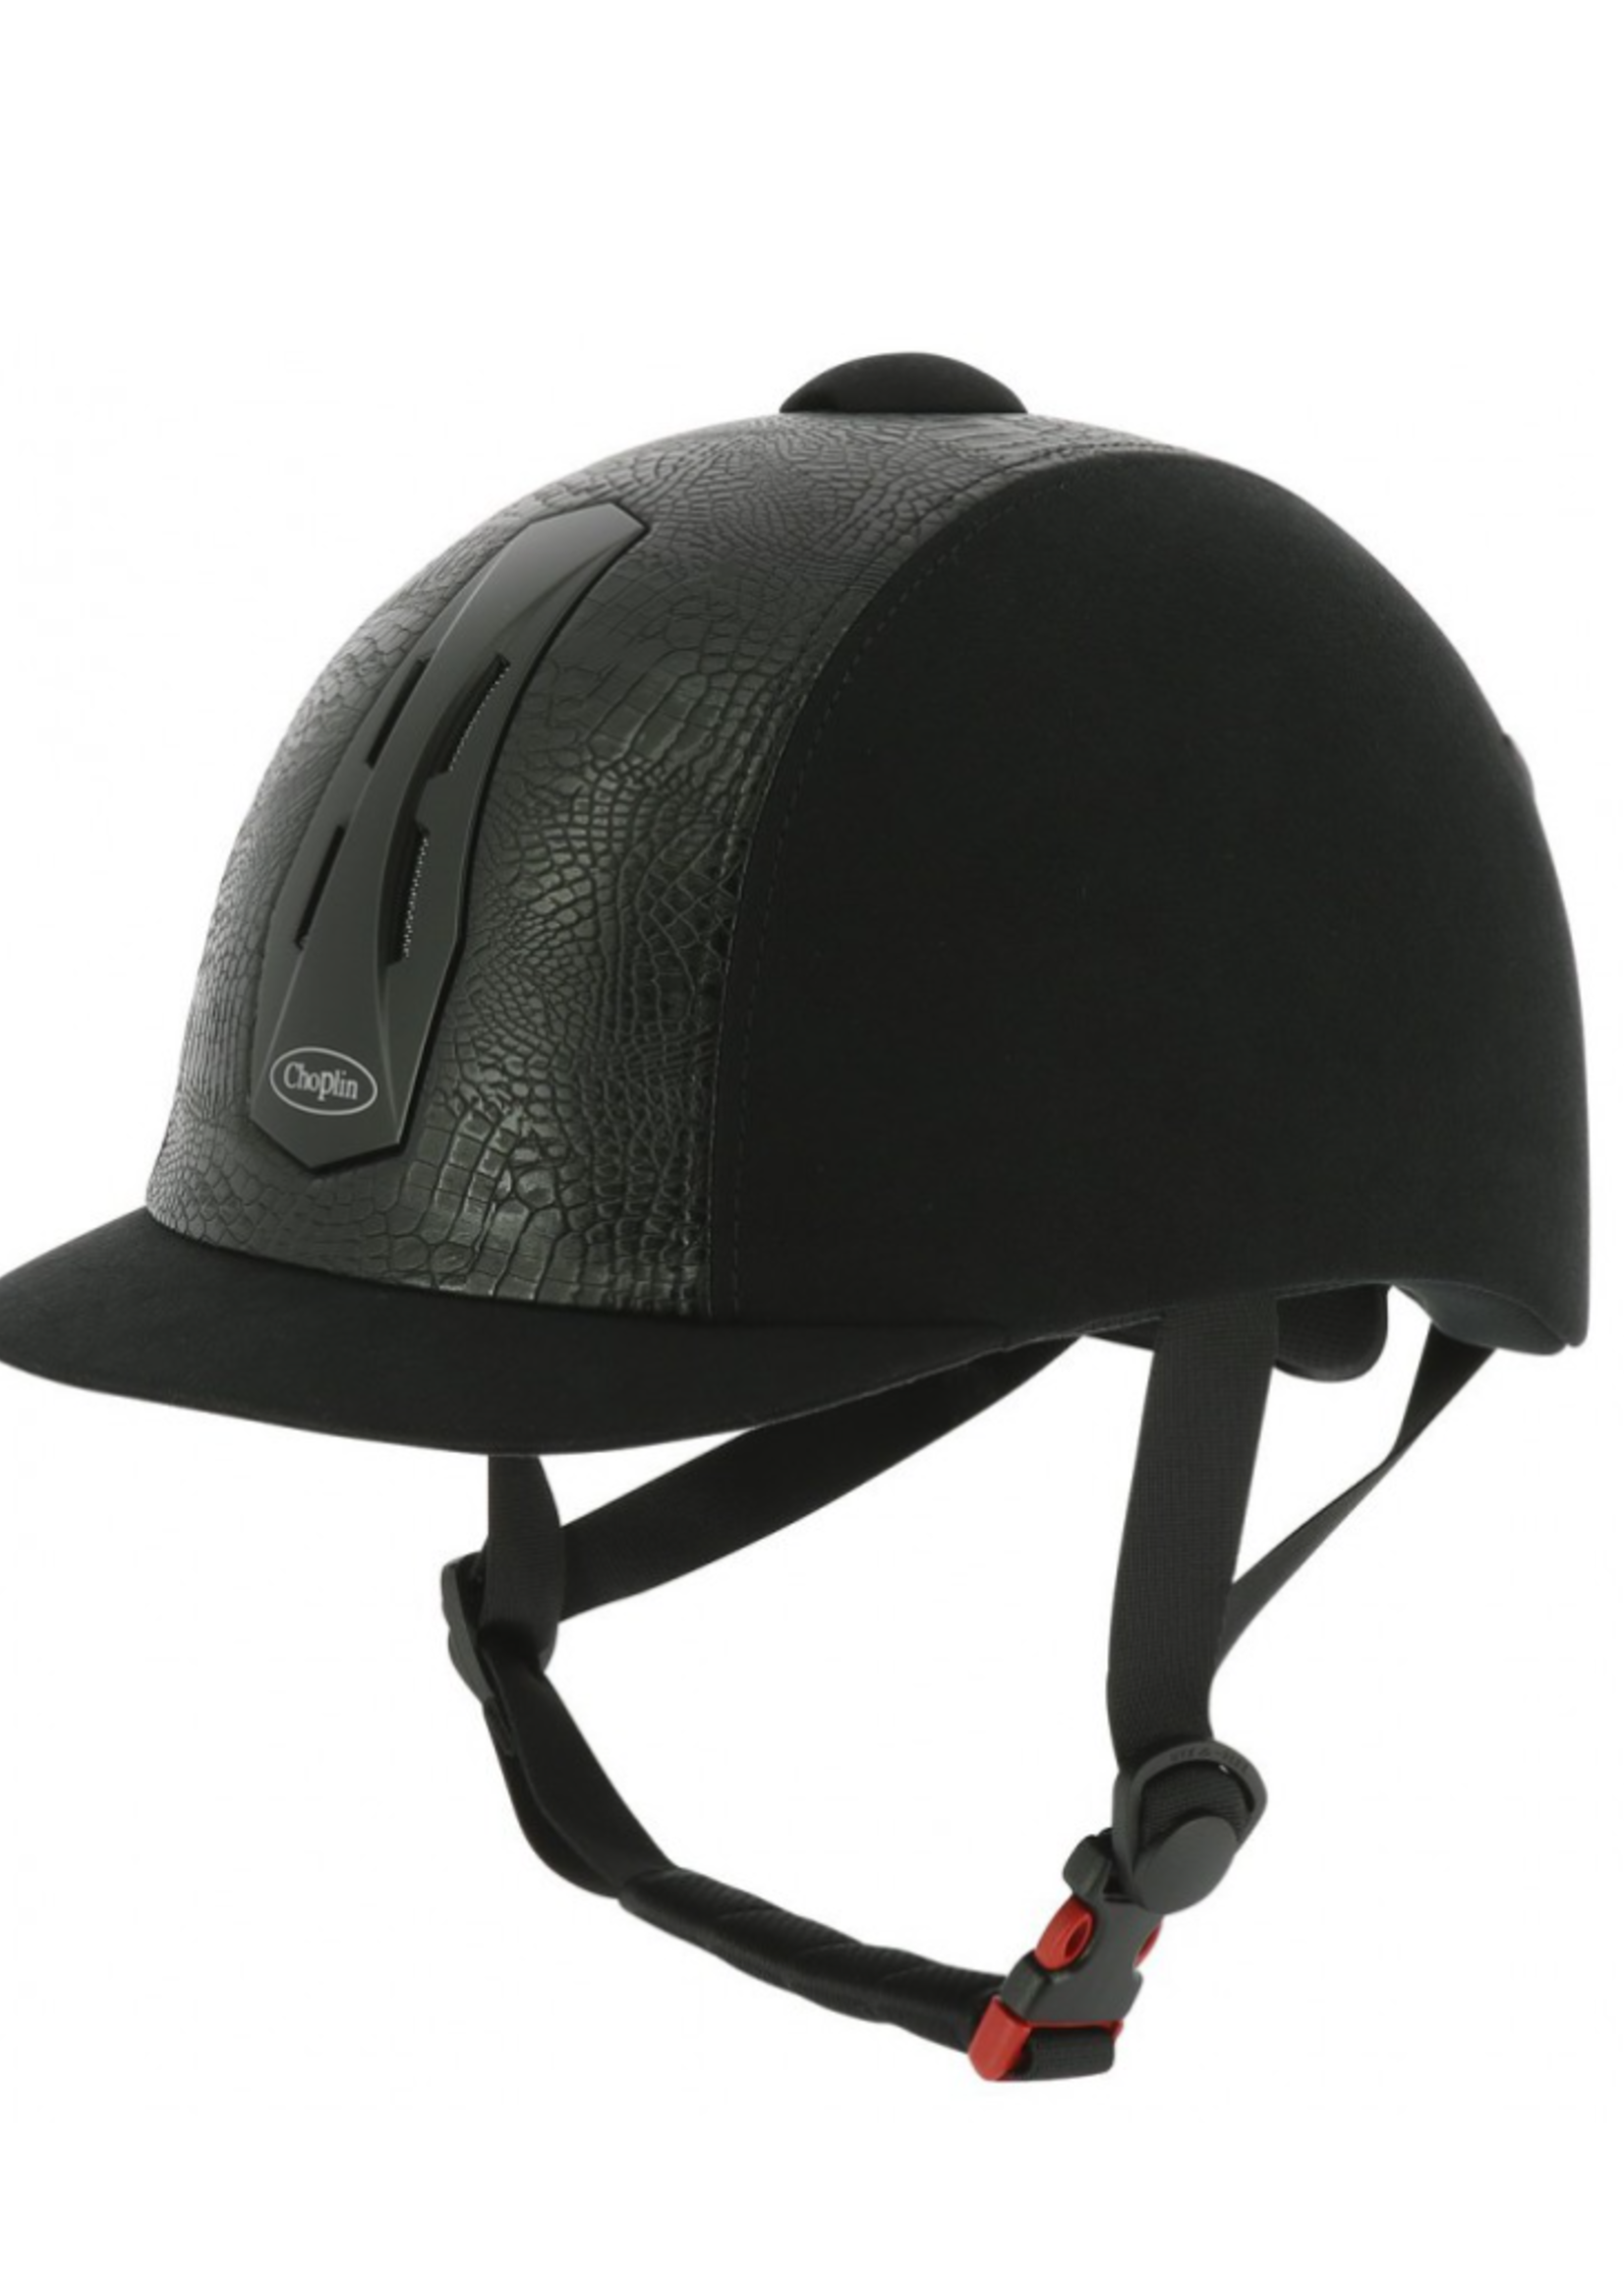 Choplin Choplin Premium Cap